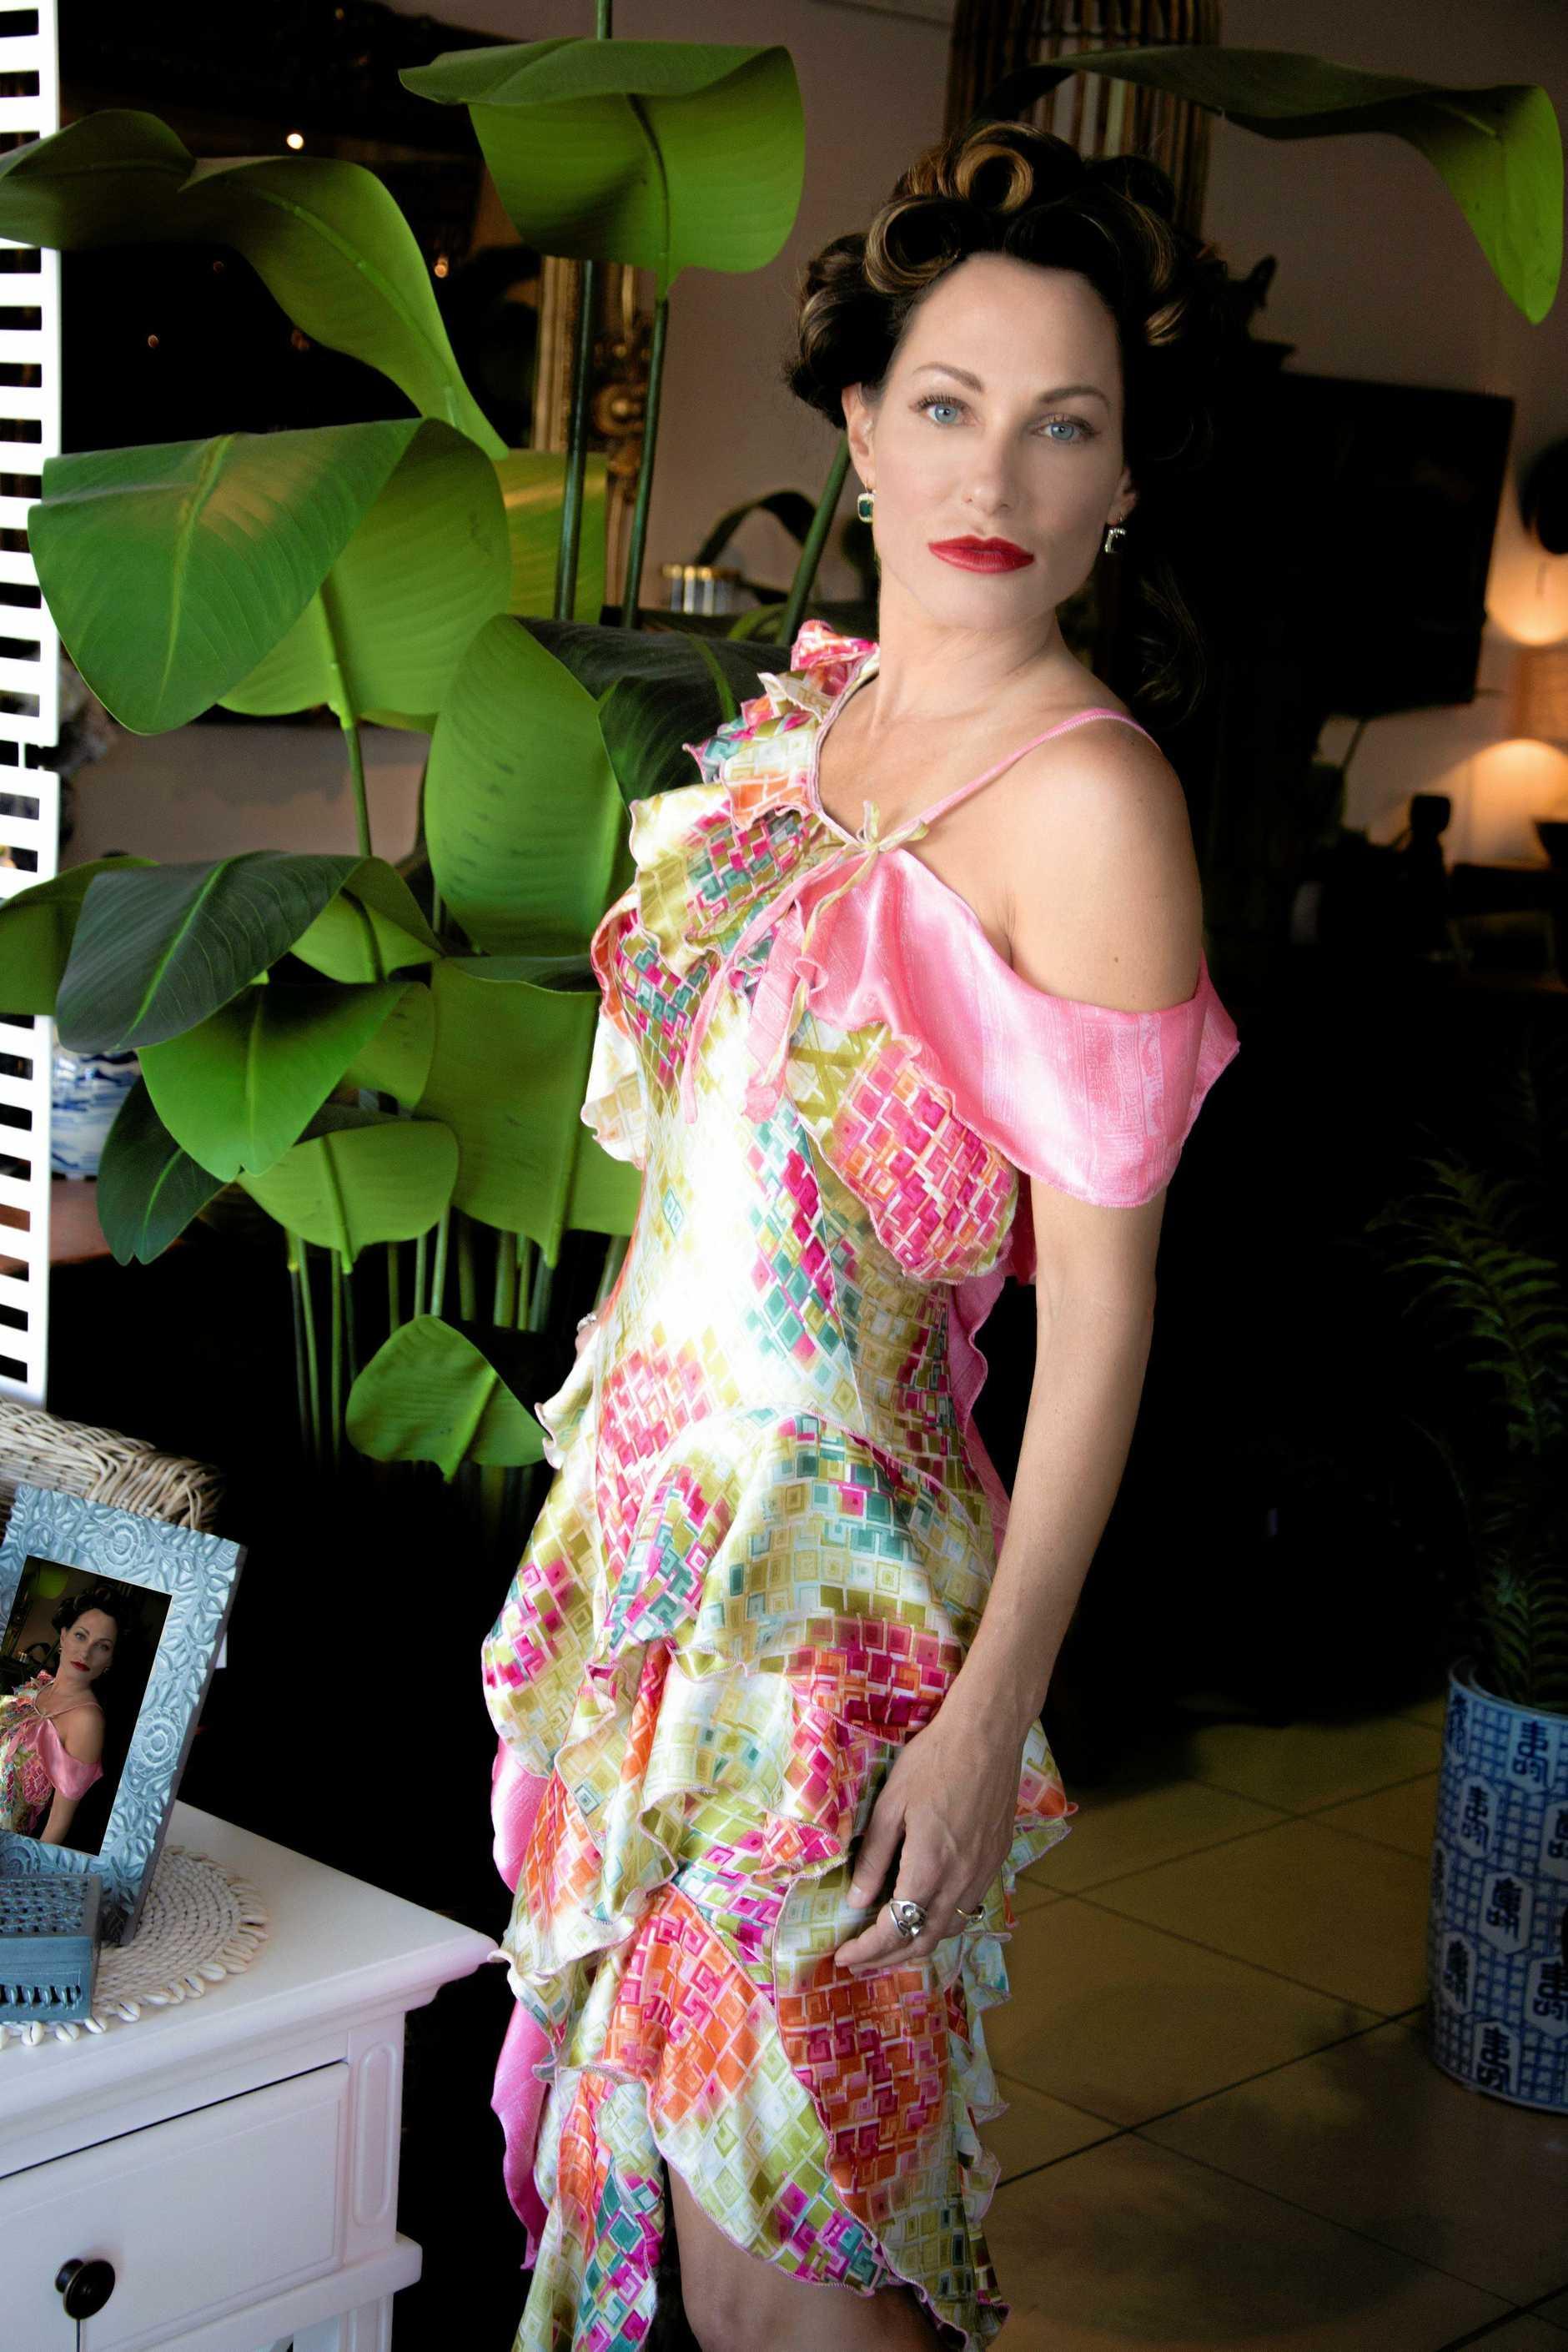 Model Mirta Parenza wearing one of Jason Chetcuti's exclusive designs.